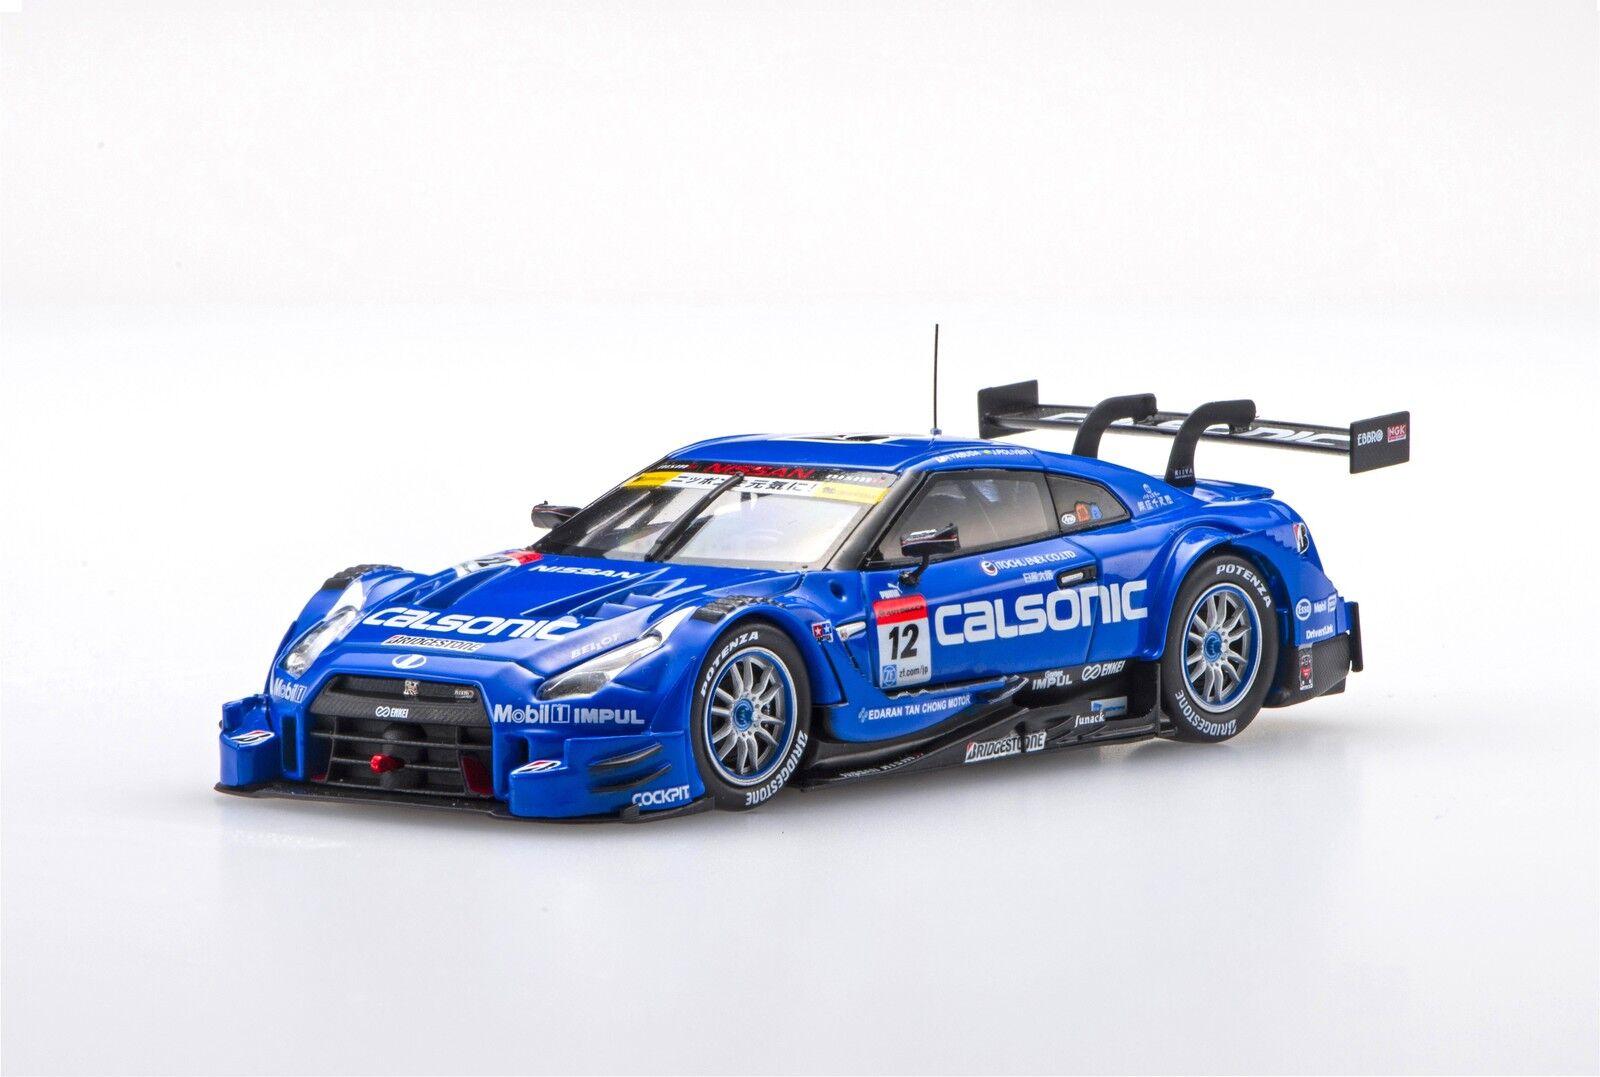 Ebbro 45398 1 43 Calsonic Impul Gt-r Super GT GT 500 2016 RD 2 Fuji Nº 12 blu